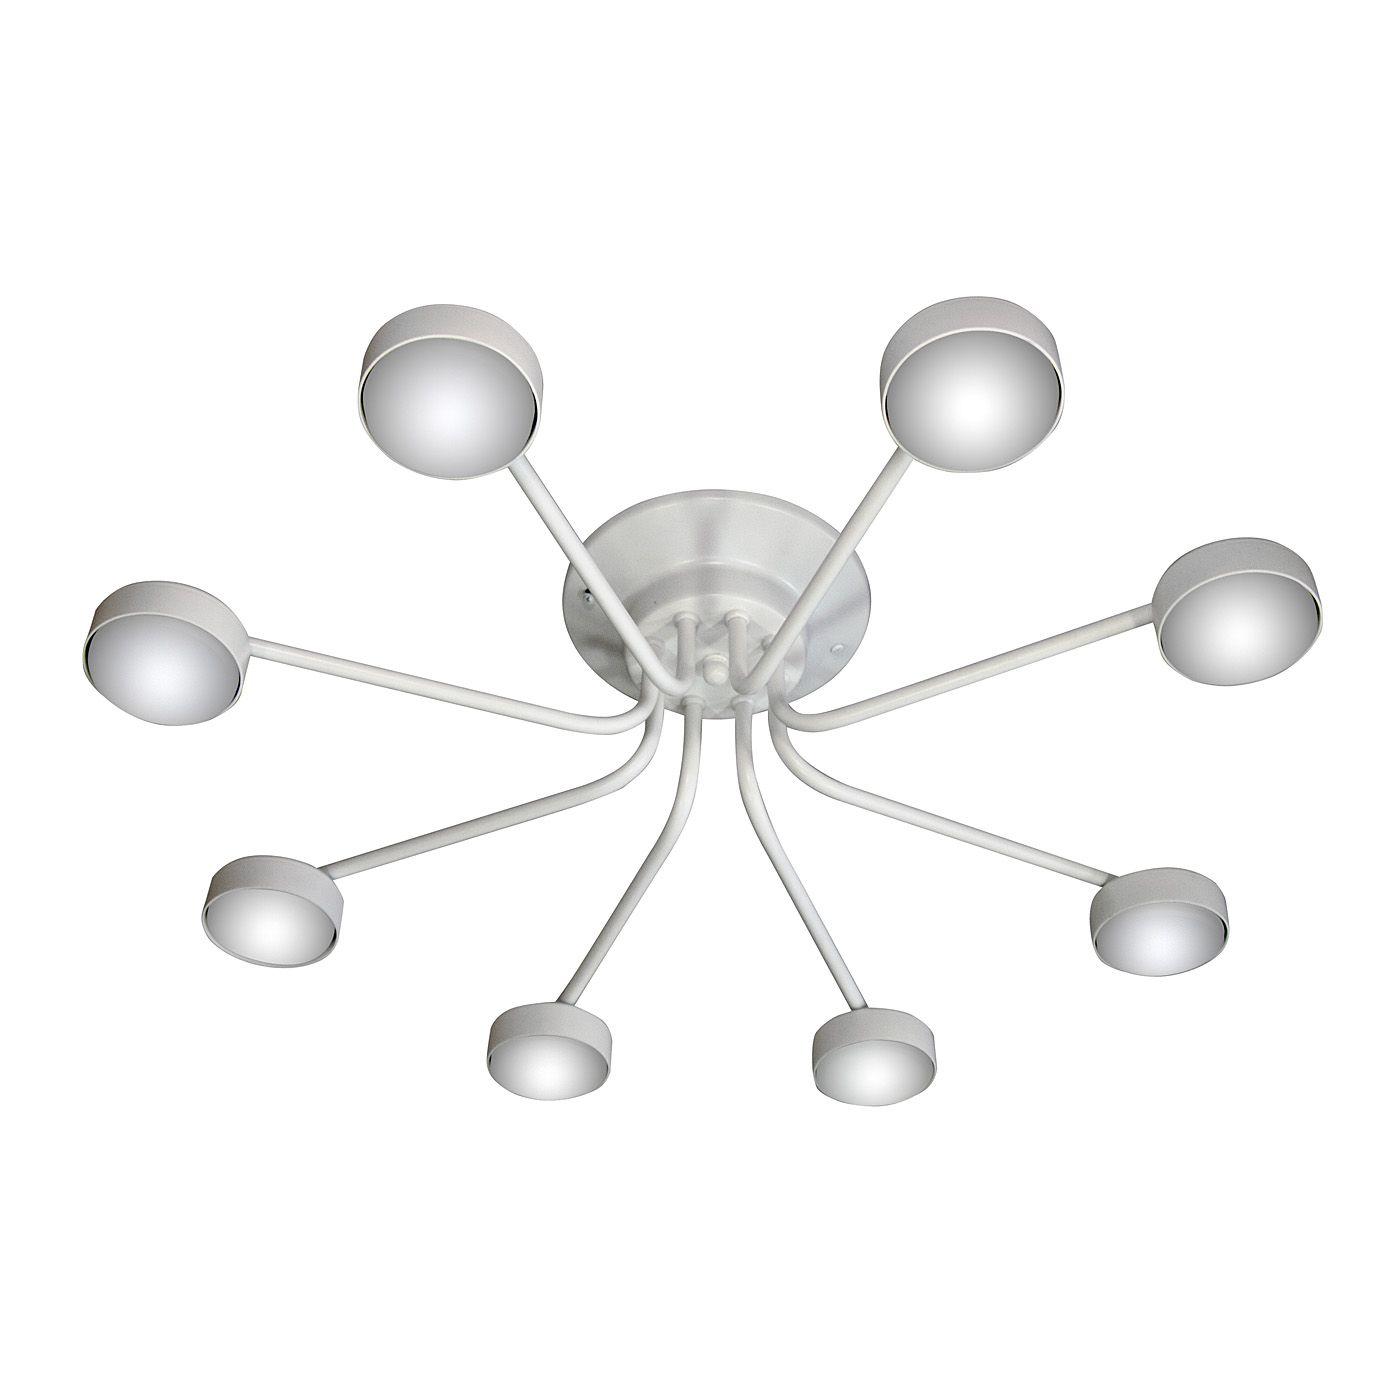 PETRASVET / Ceiling chandelier S2396-8, 8xGX53